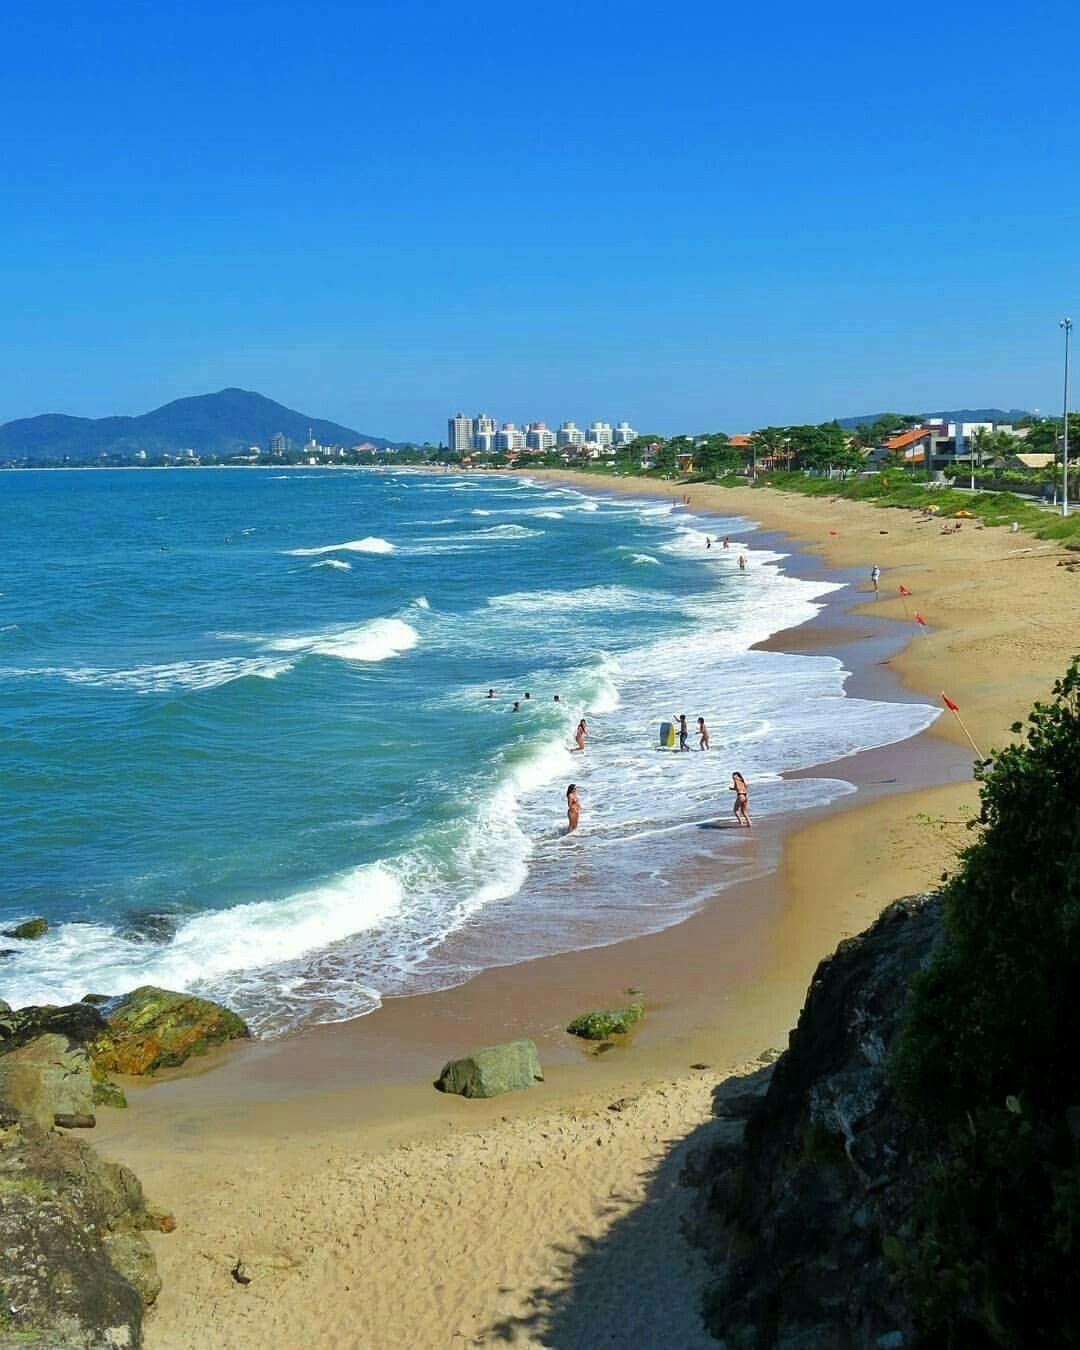 Penha Santa Catarina fonte: i.pinimg.com